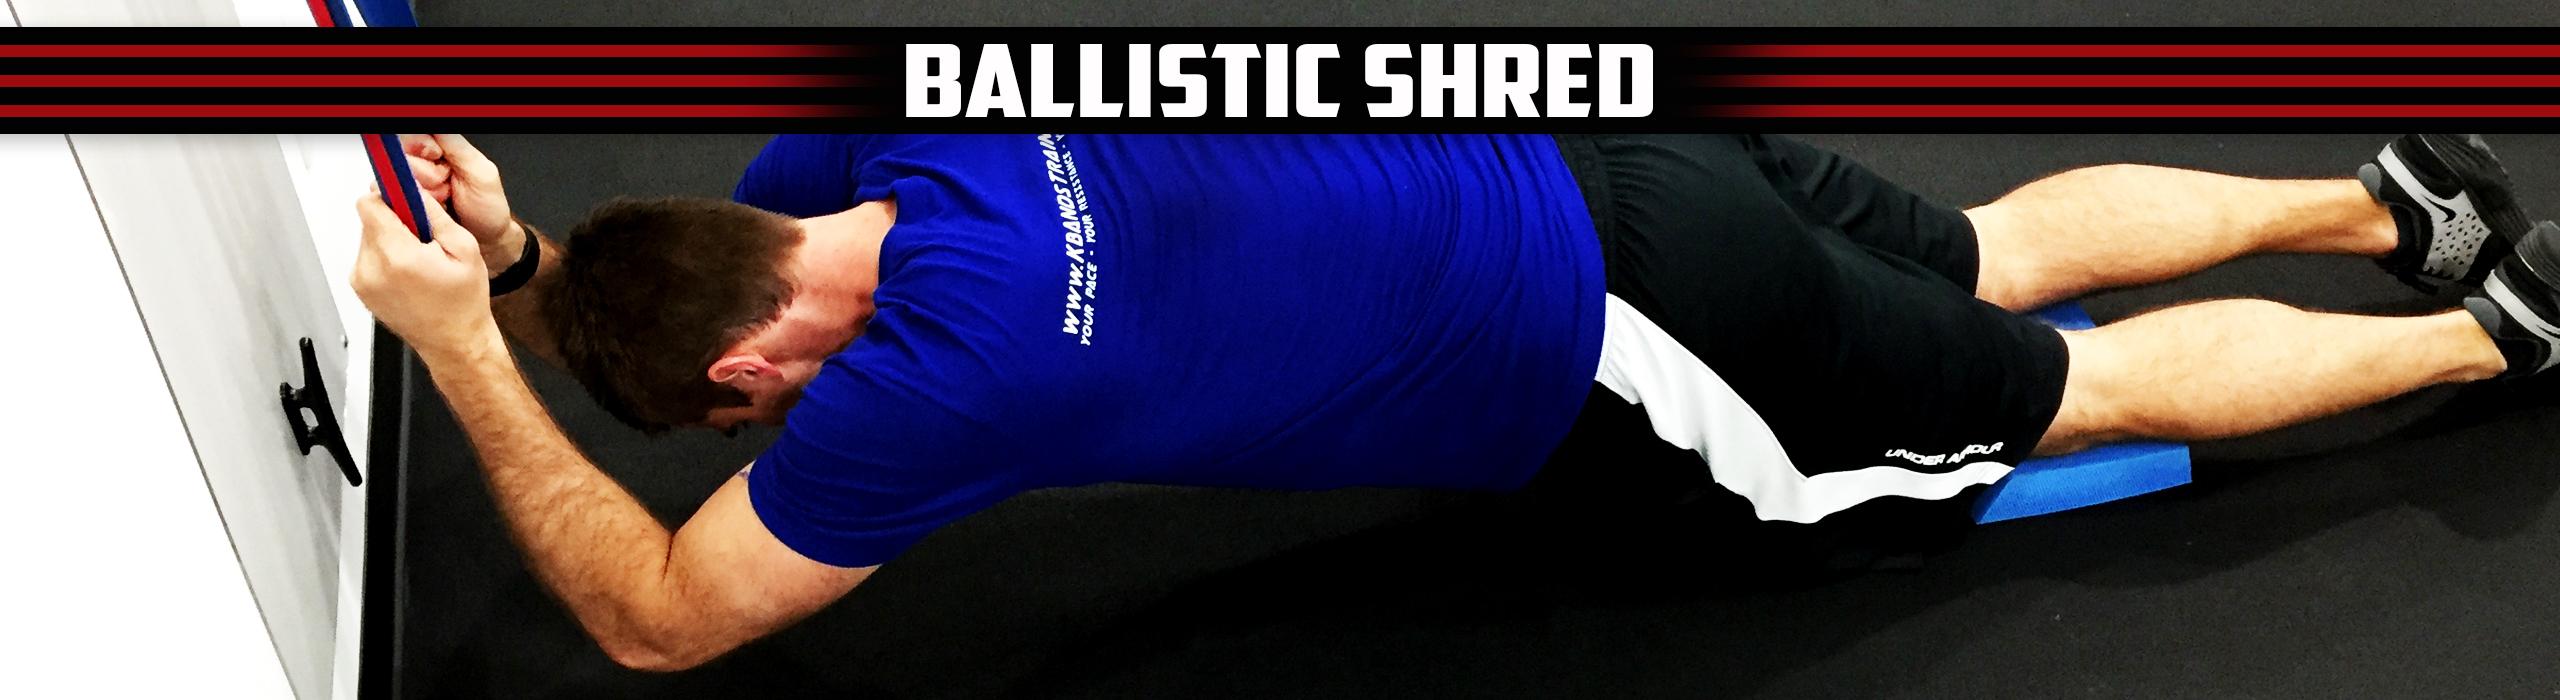 Ballistic Shred